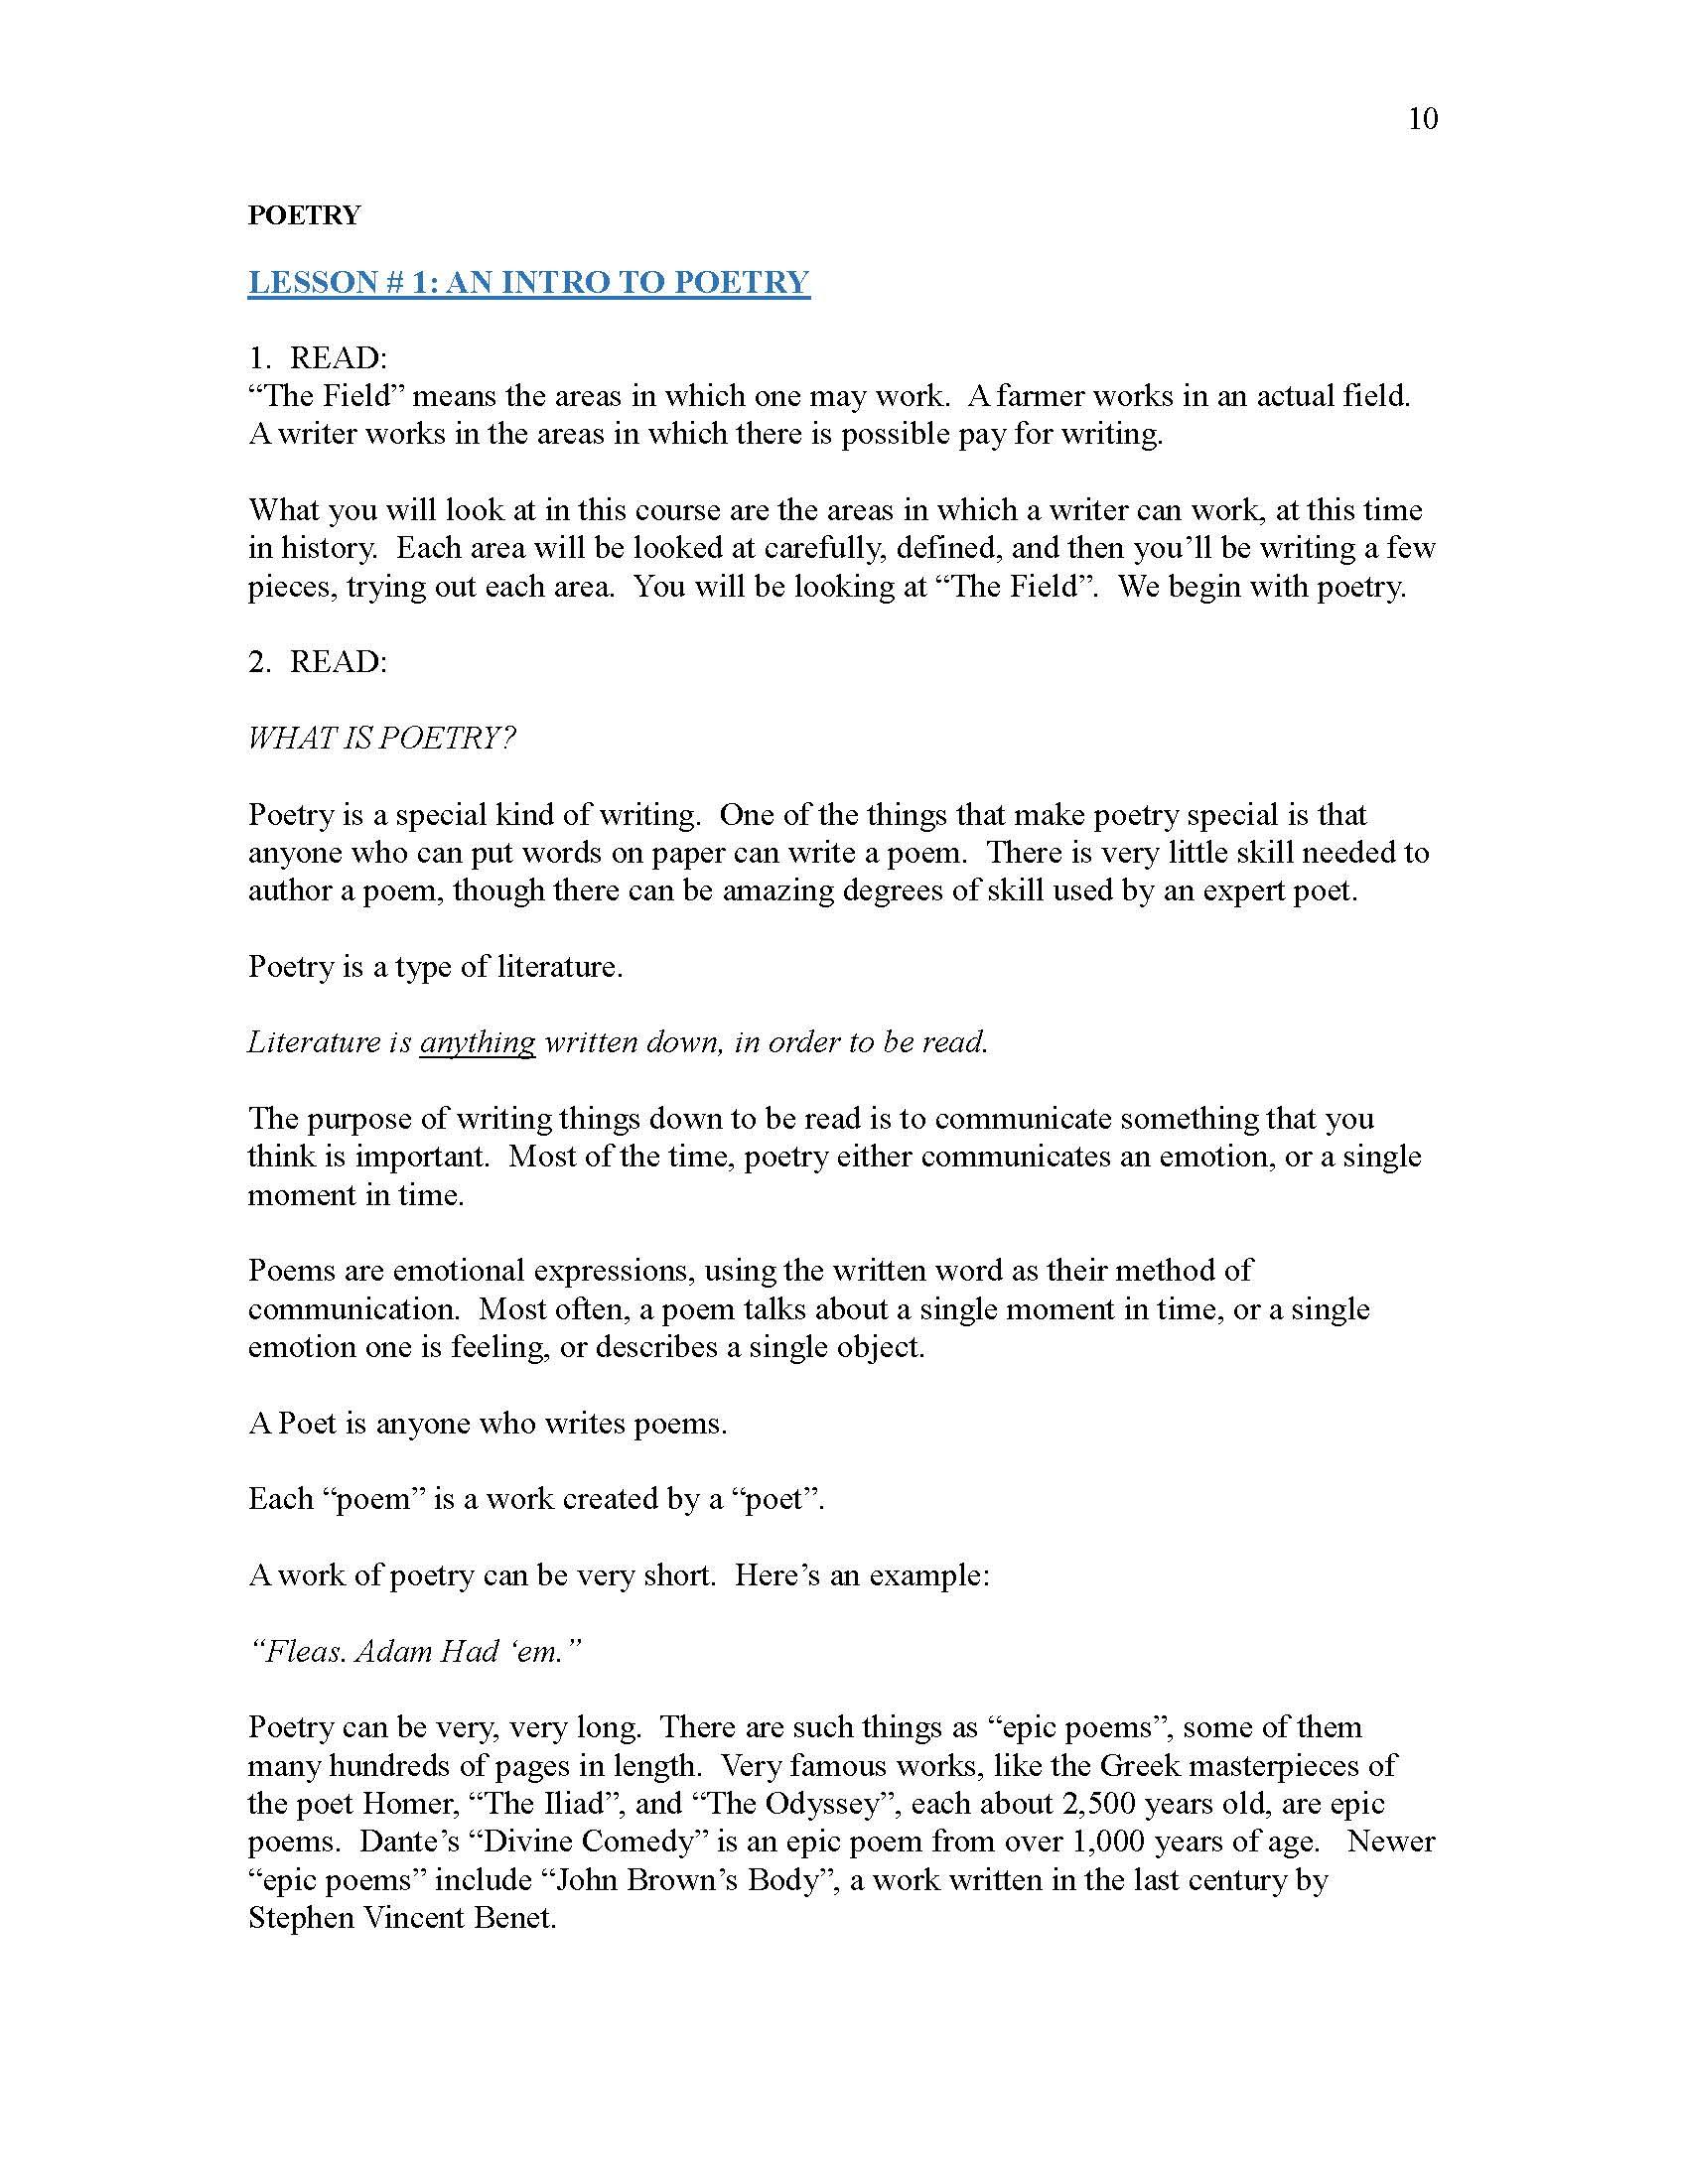 Step 4 Creative Writing 5 - The Field_Page_011.jpg